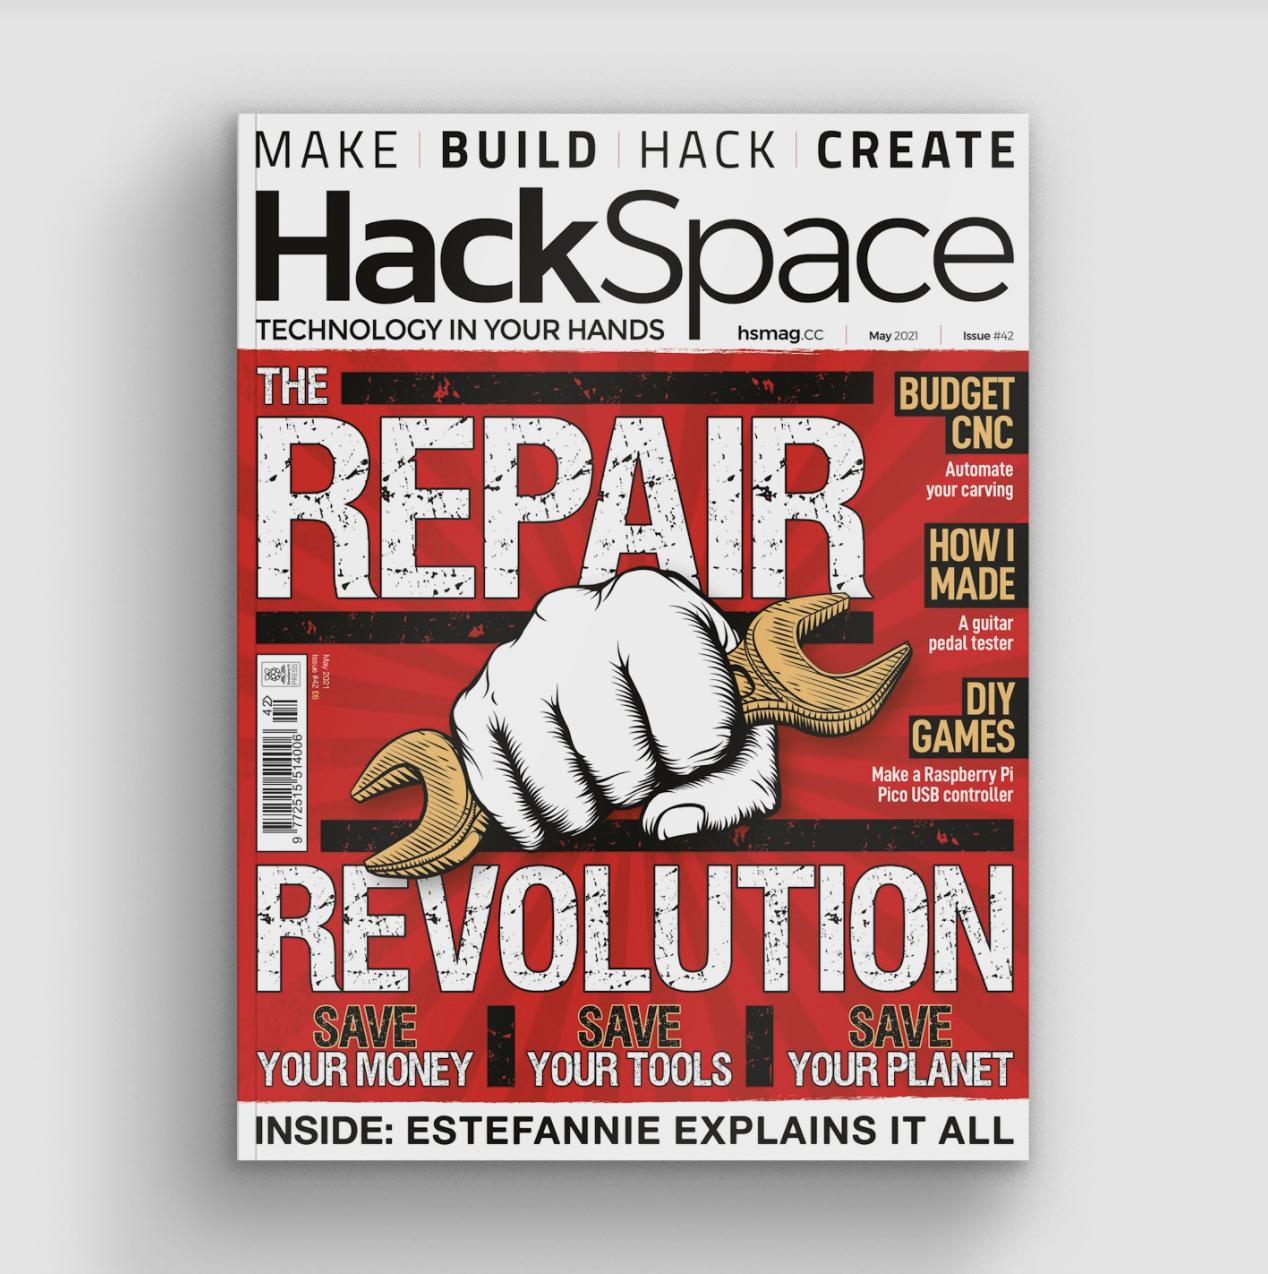 Custom USB games controllers with Raspberry Pi Pico | HackSpace 42